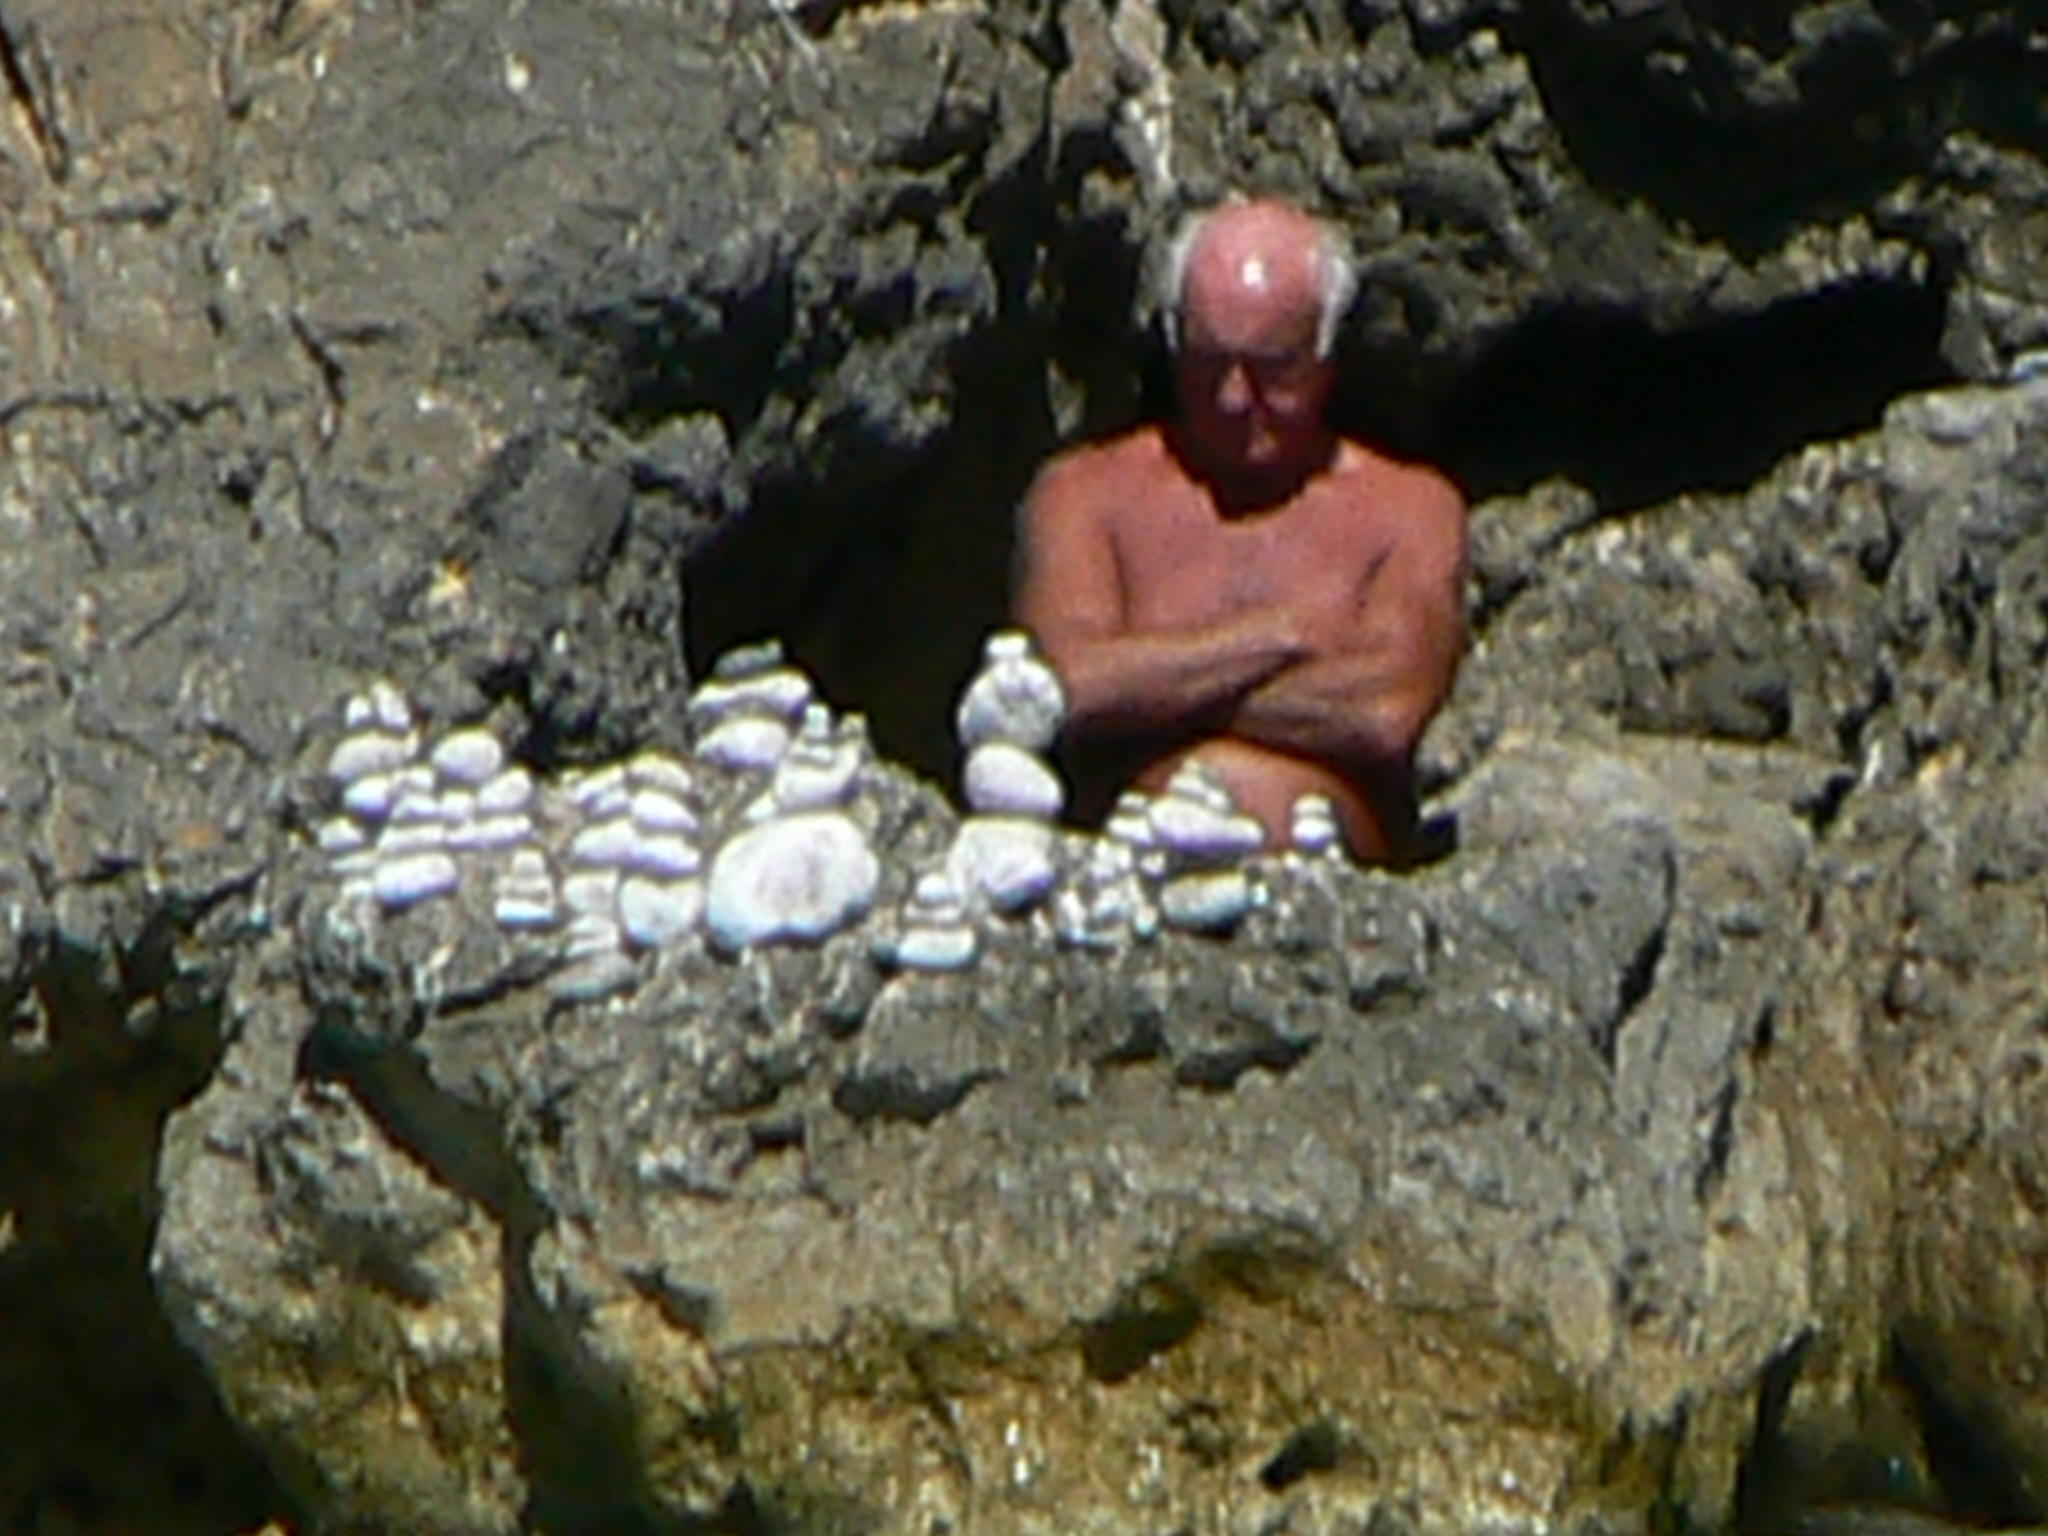 Stone smurf